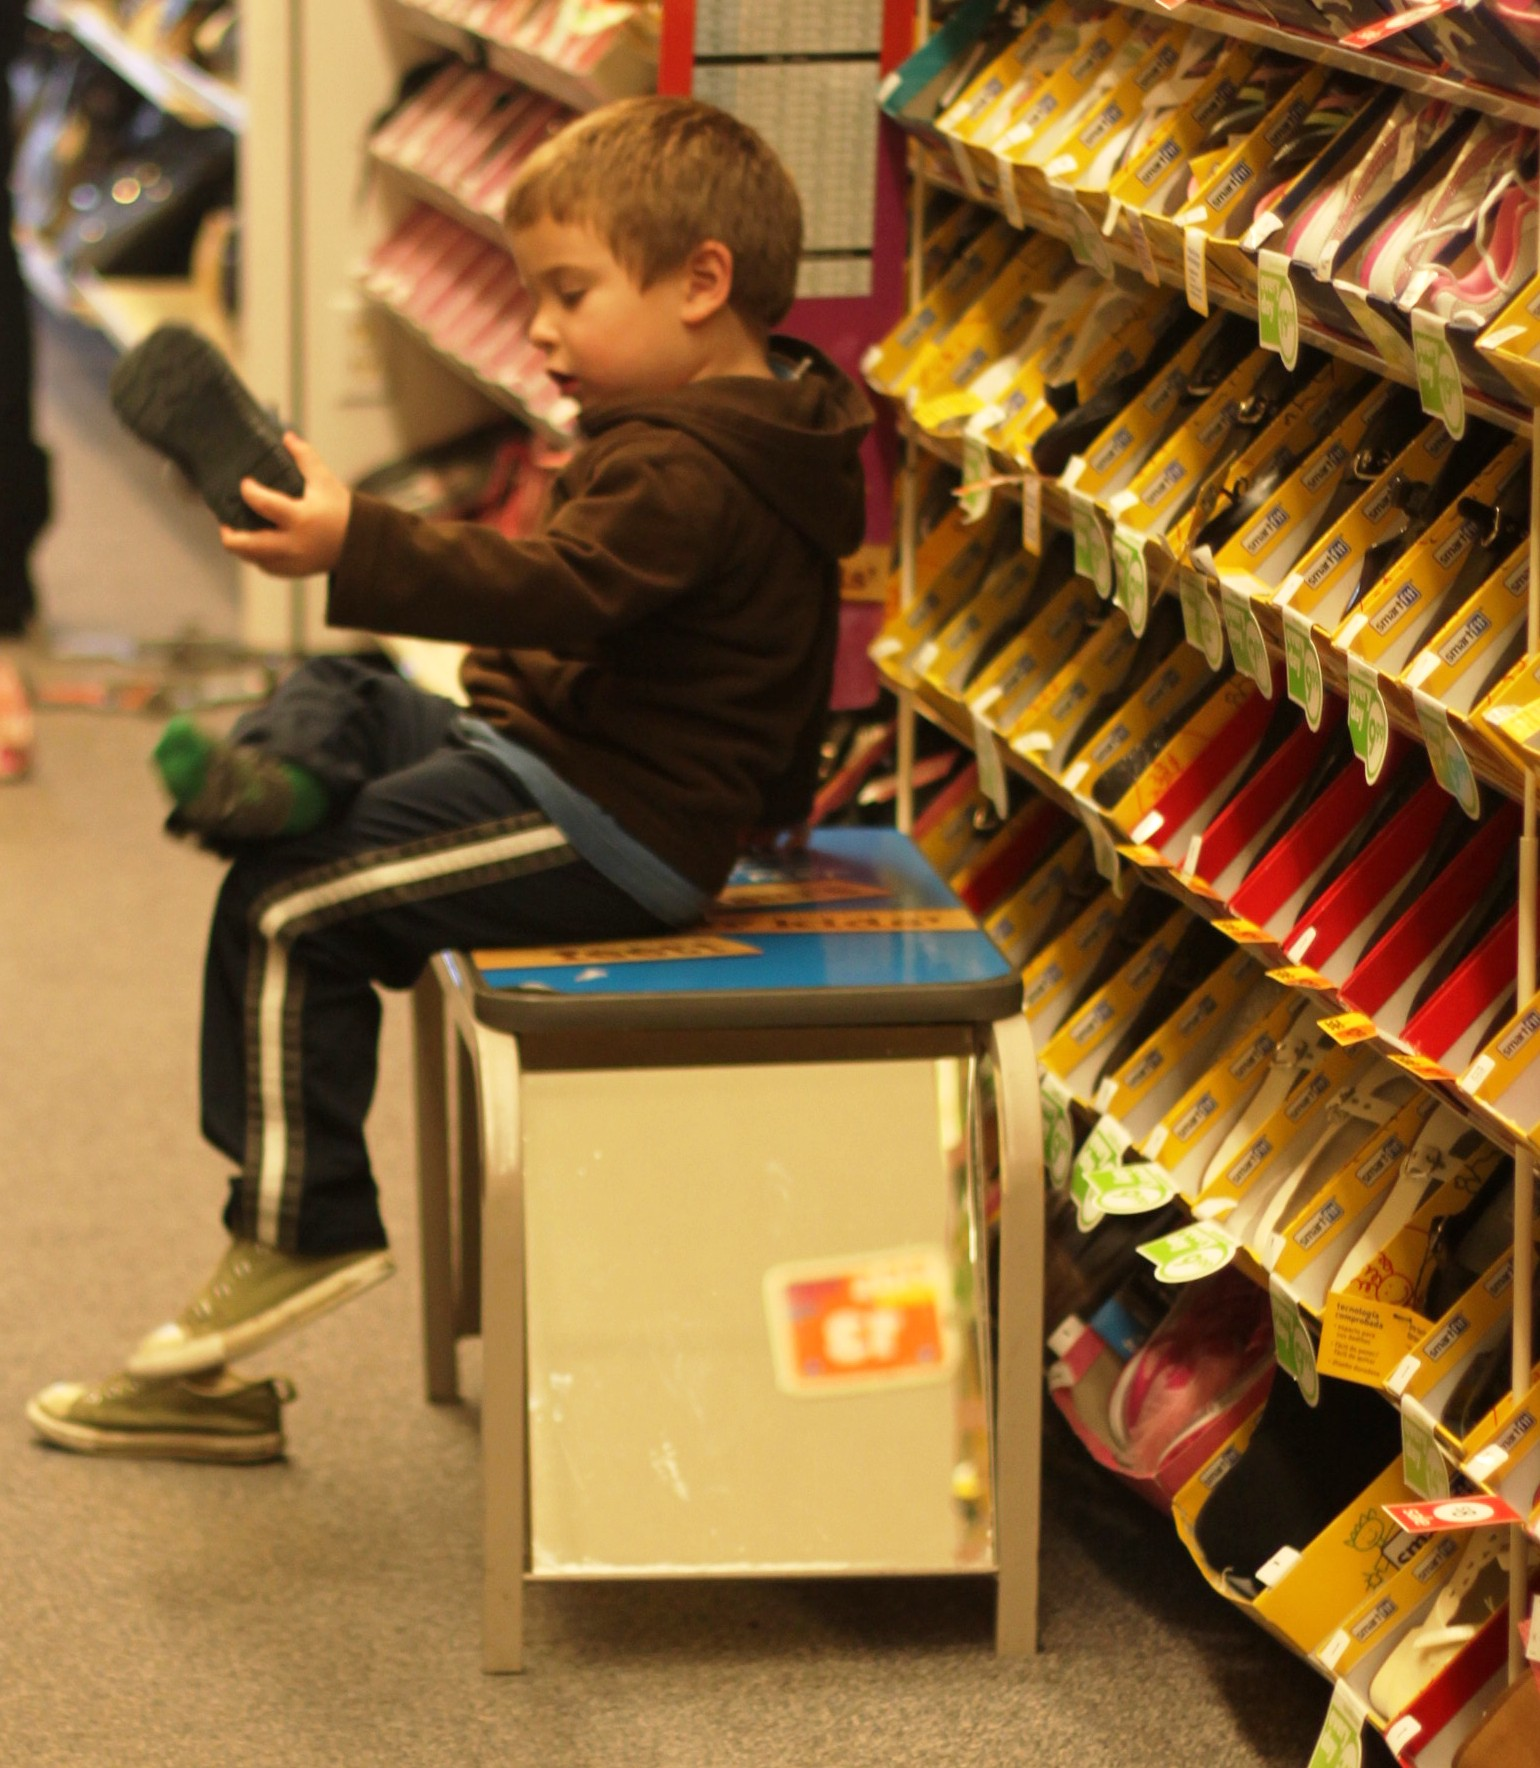 Kid Shoe Store 28 Images Sport Shoe Store Editorial Image Image 30332140 Shoe Shop Window